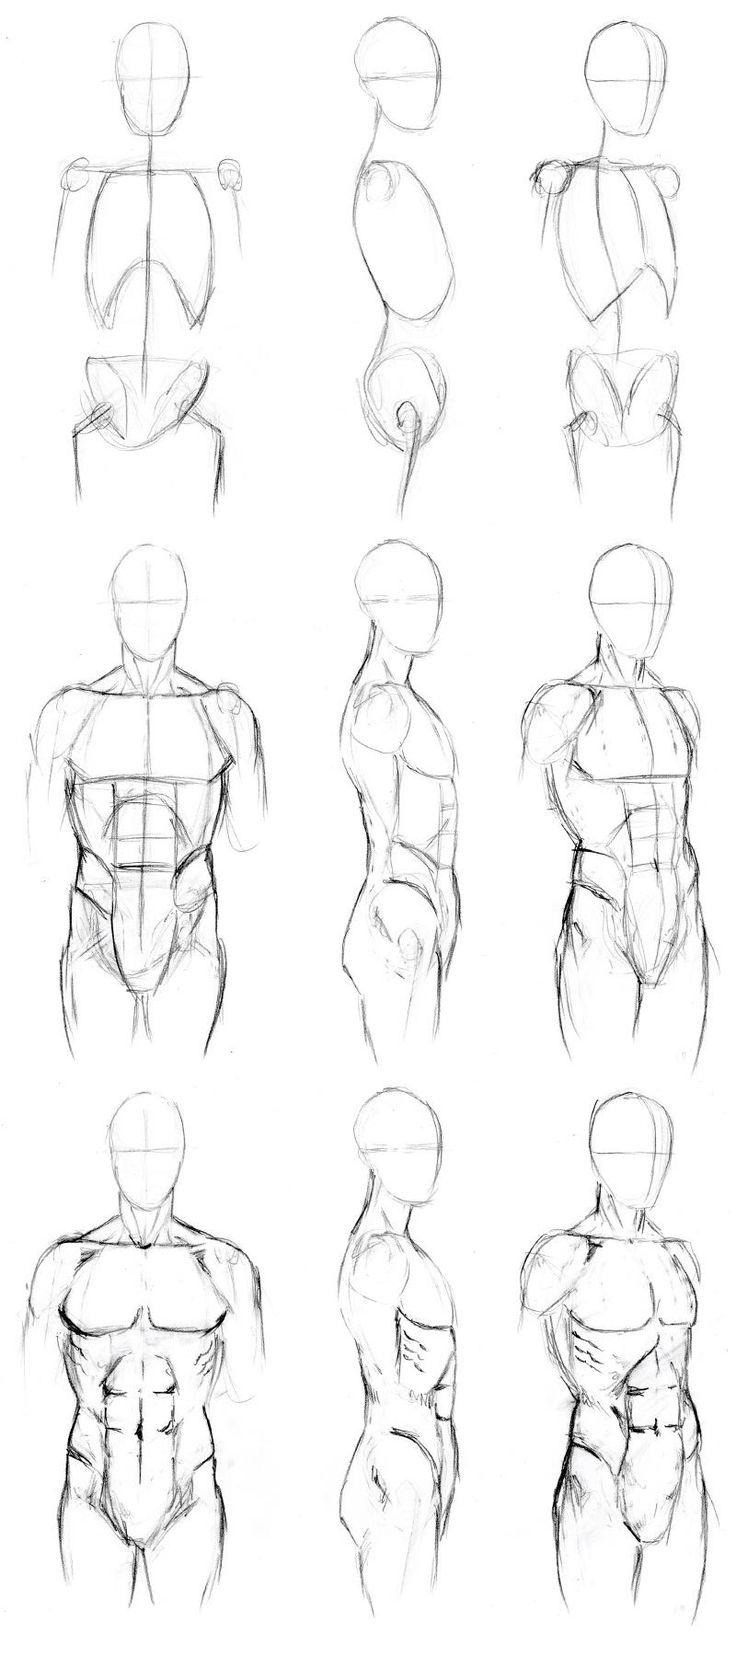 736x1656 Drawing Human Anatomy Inspiring Learn To Draw Human Anatomy